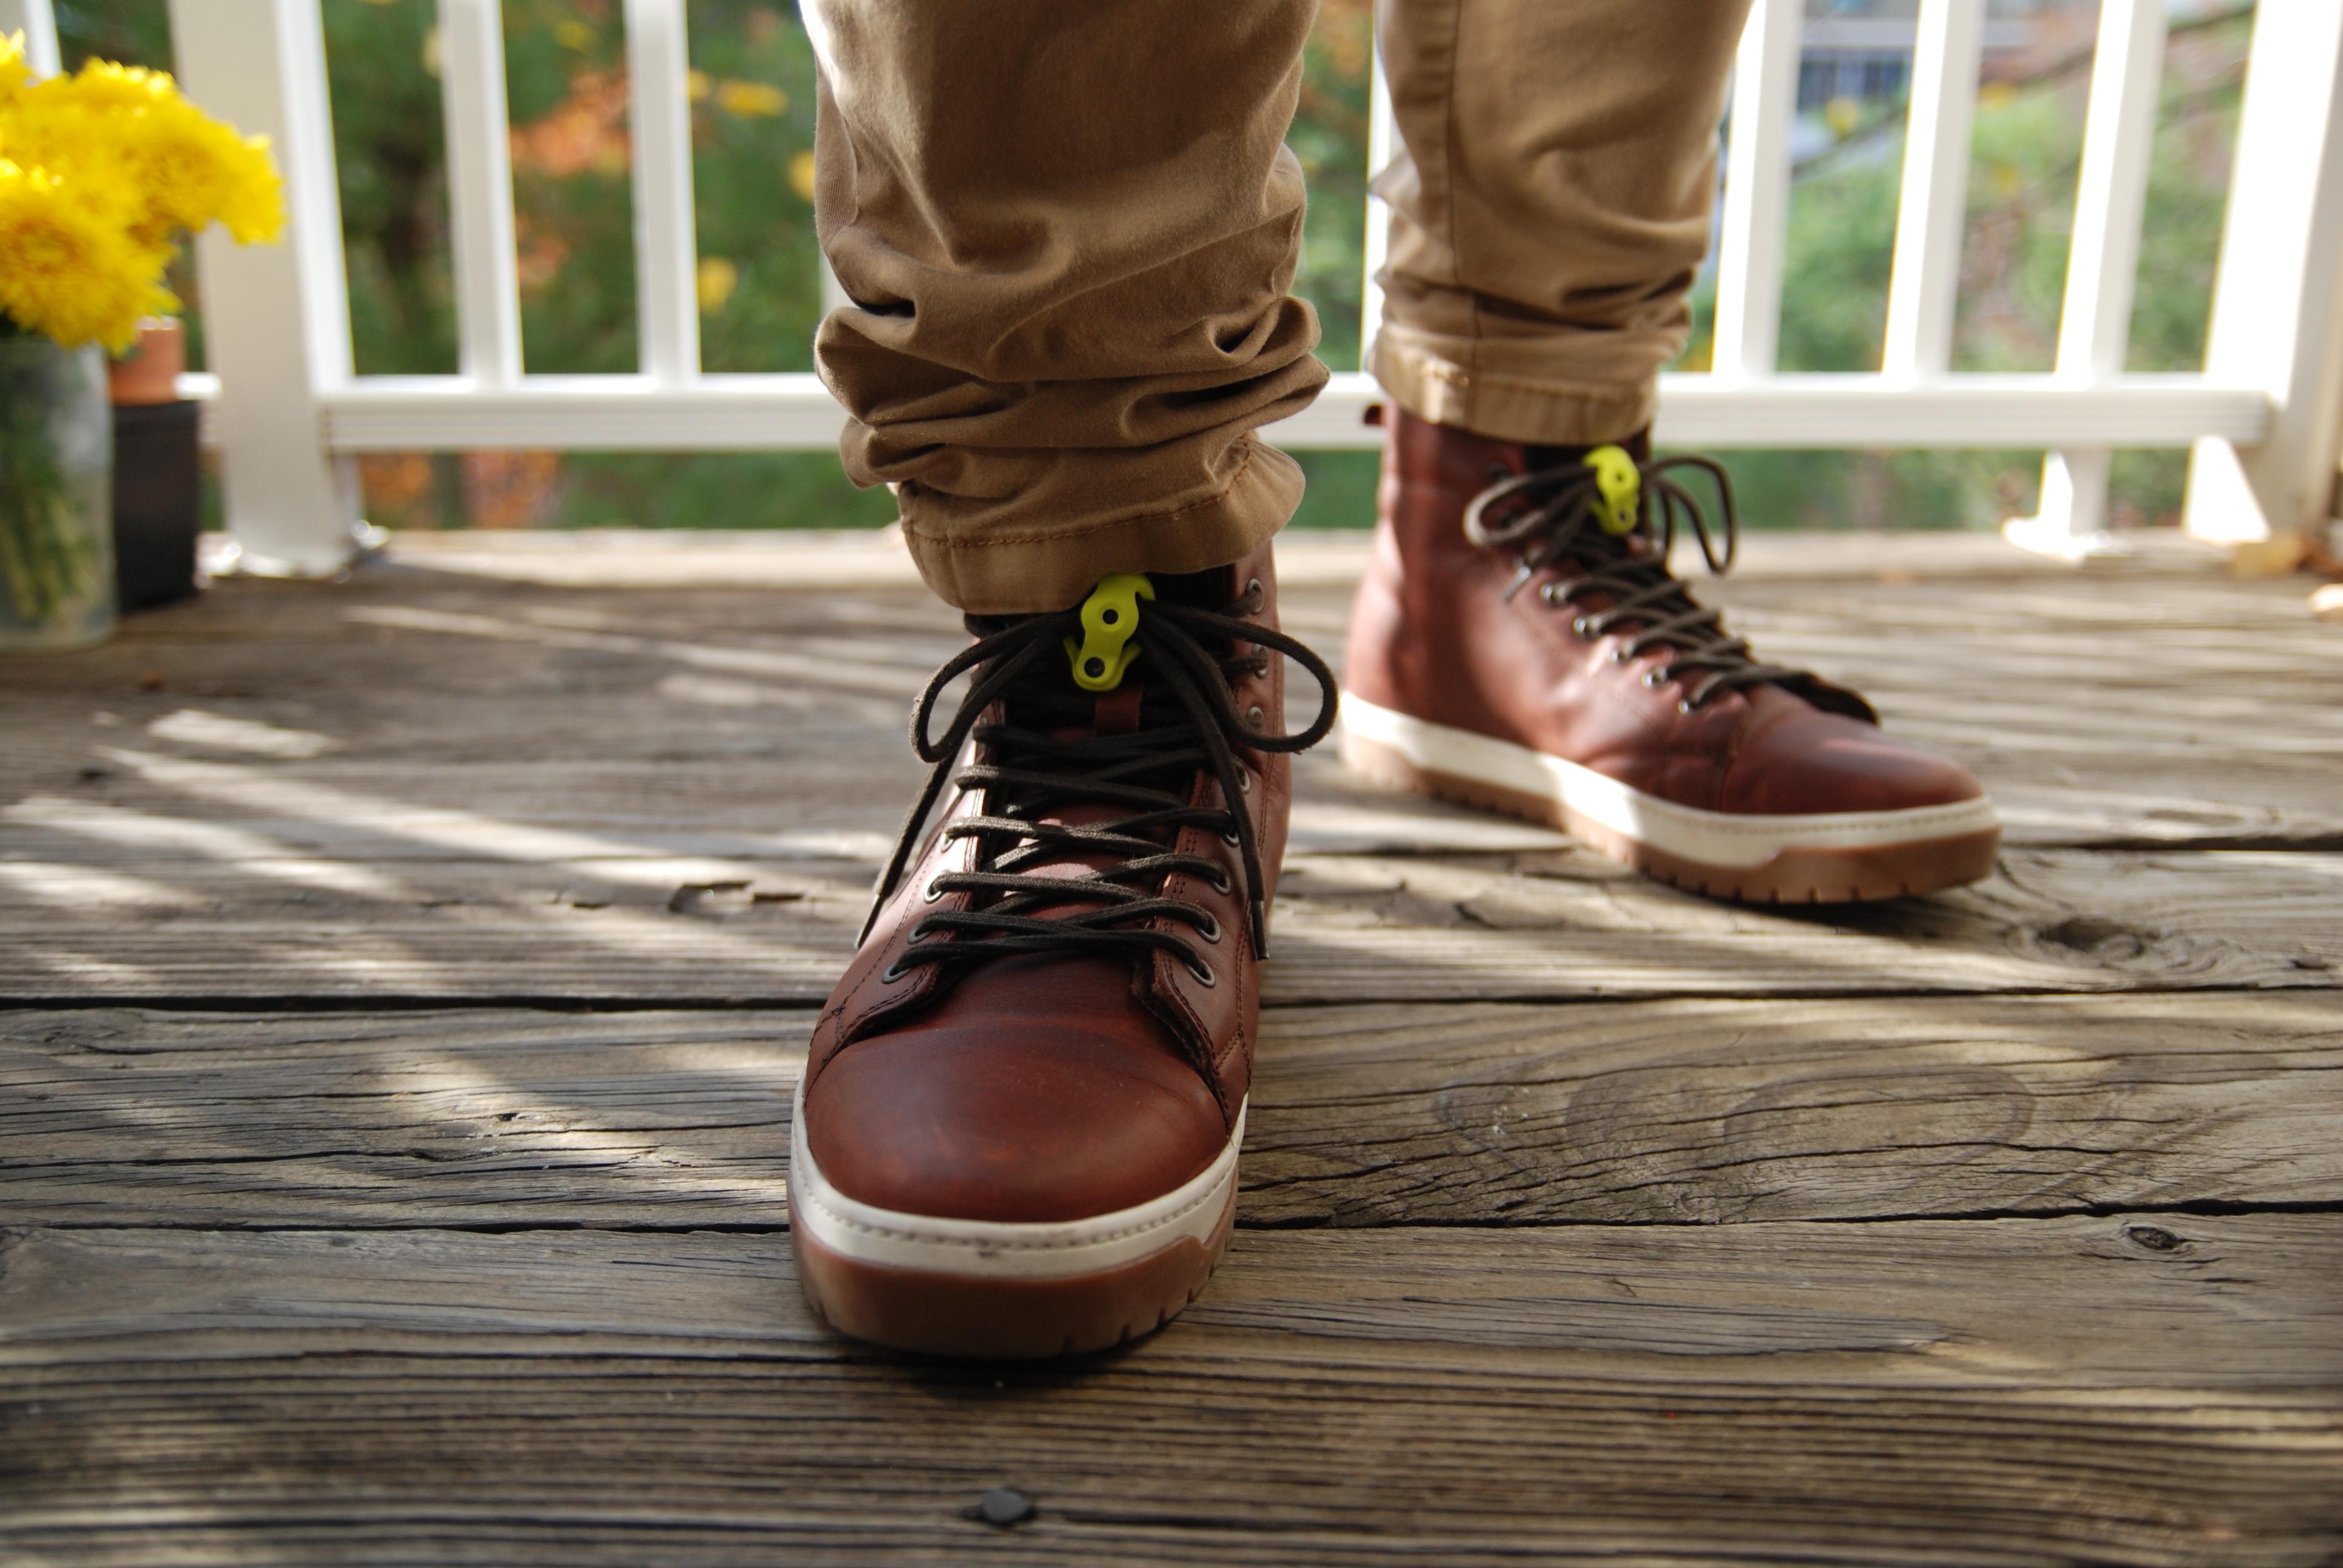 02-Klickers shoelace lock 05